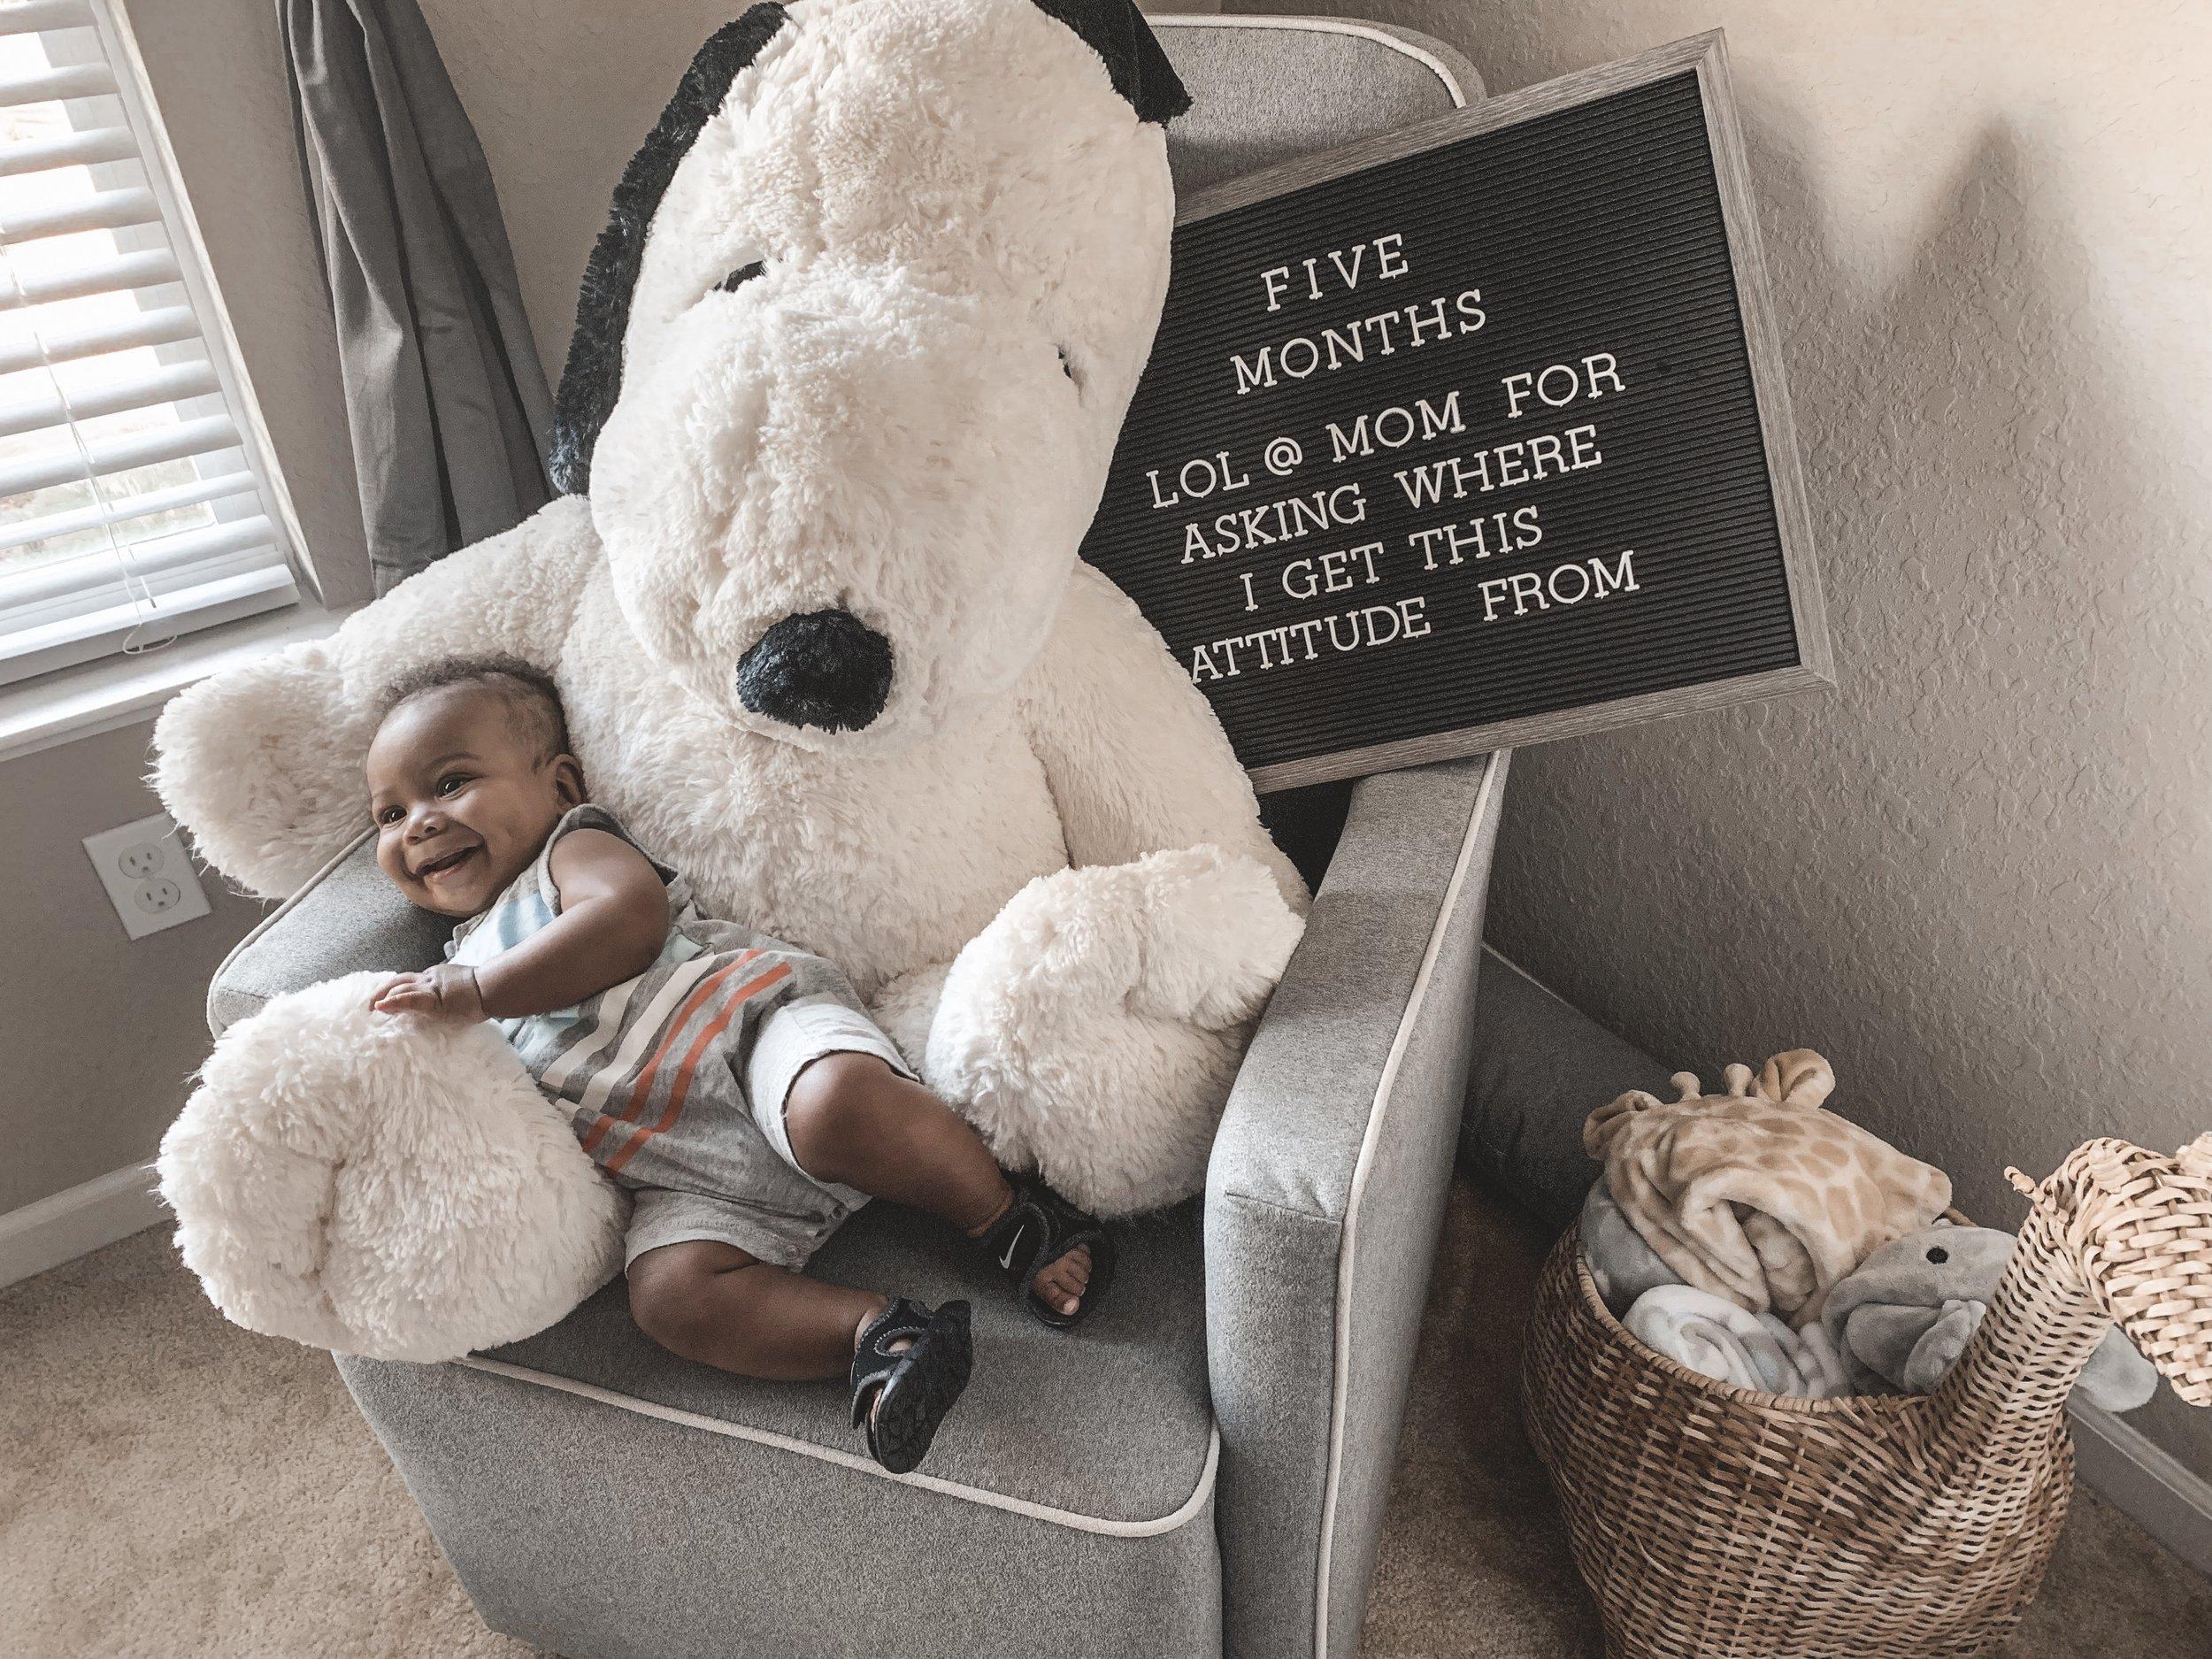 micah 5 months